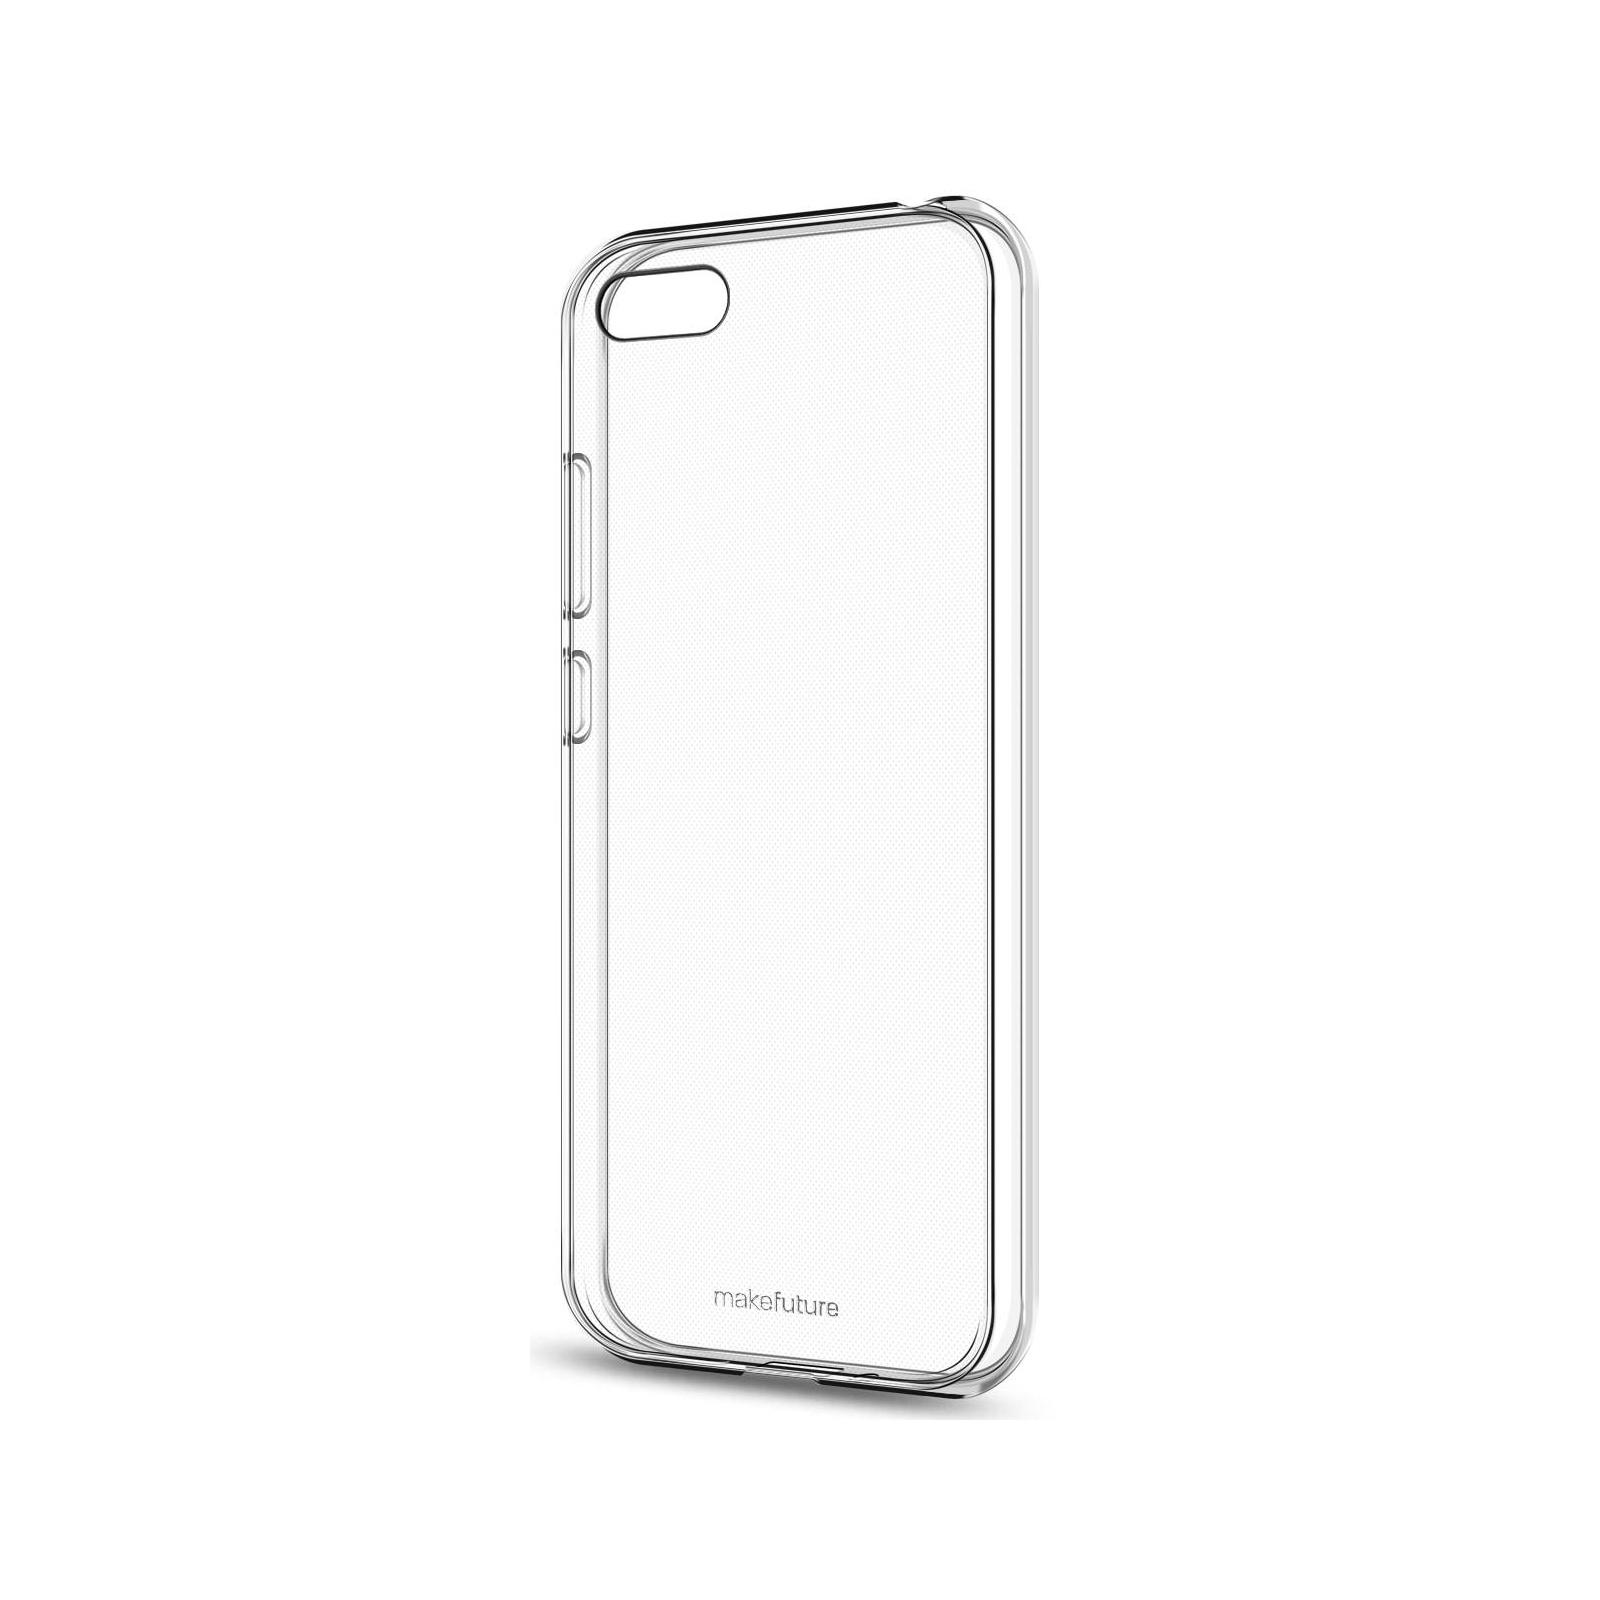 Чехол для моб. телефона MakeFuture Air Case (TPU) Honor 7A Clear (MCA-H7AСL / MCA-H7A)